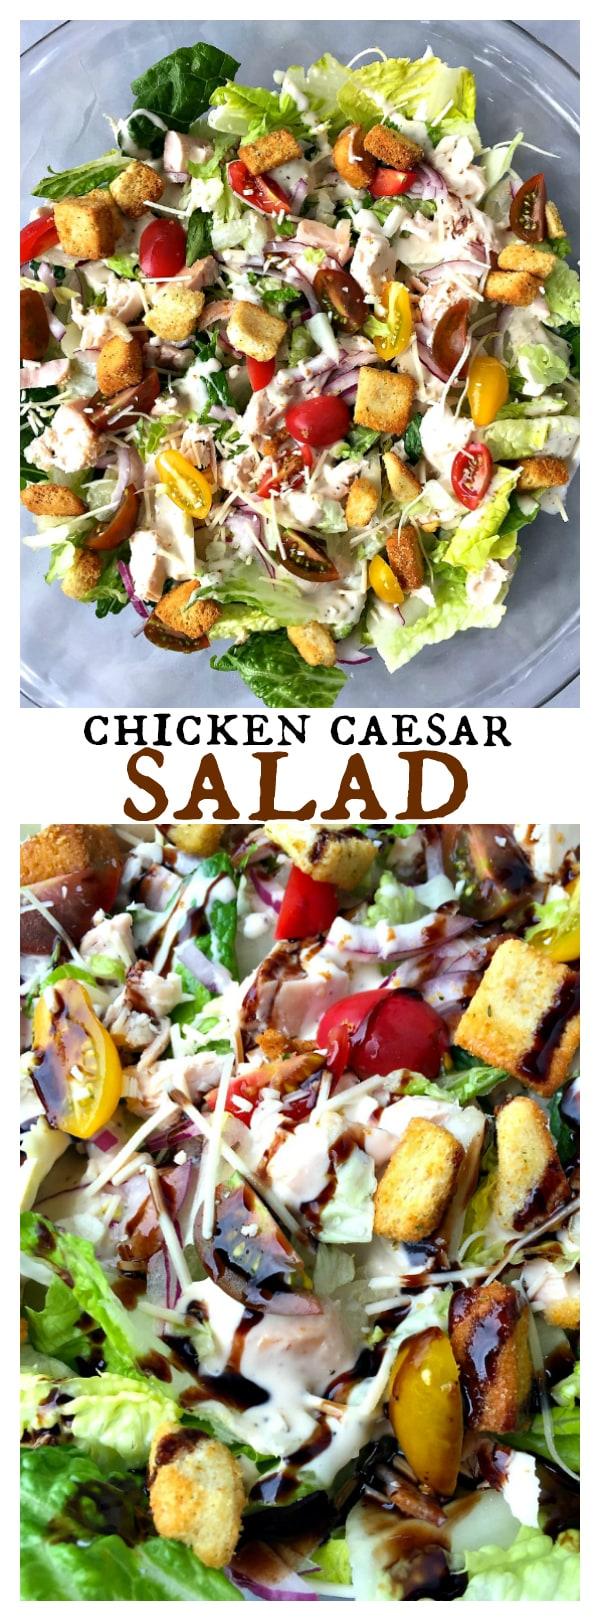 Chicken Caesar Salad with homemade dressing